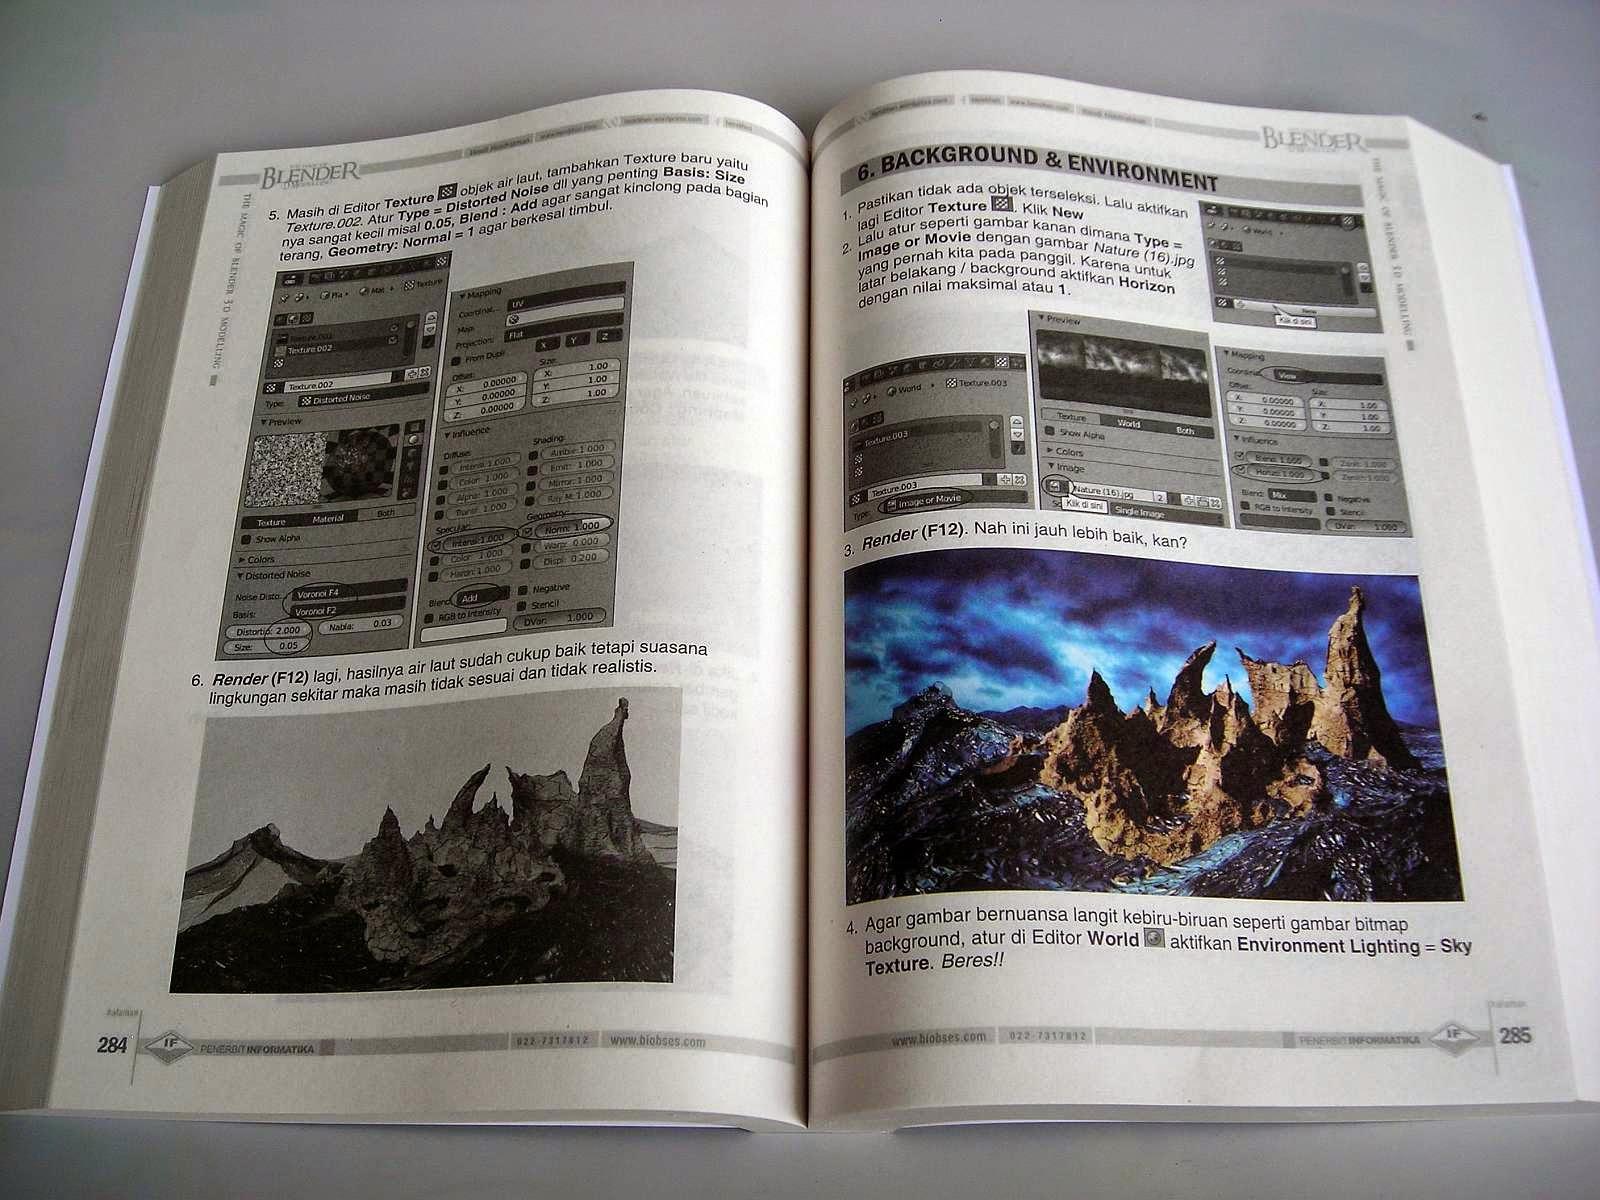 Blender 2 6 Character Modeling Tutorial : Buku blender d terlengkap tutorial bahasa indonesia